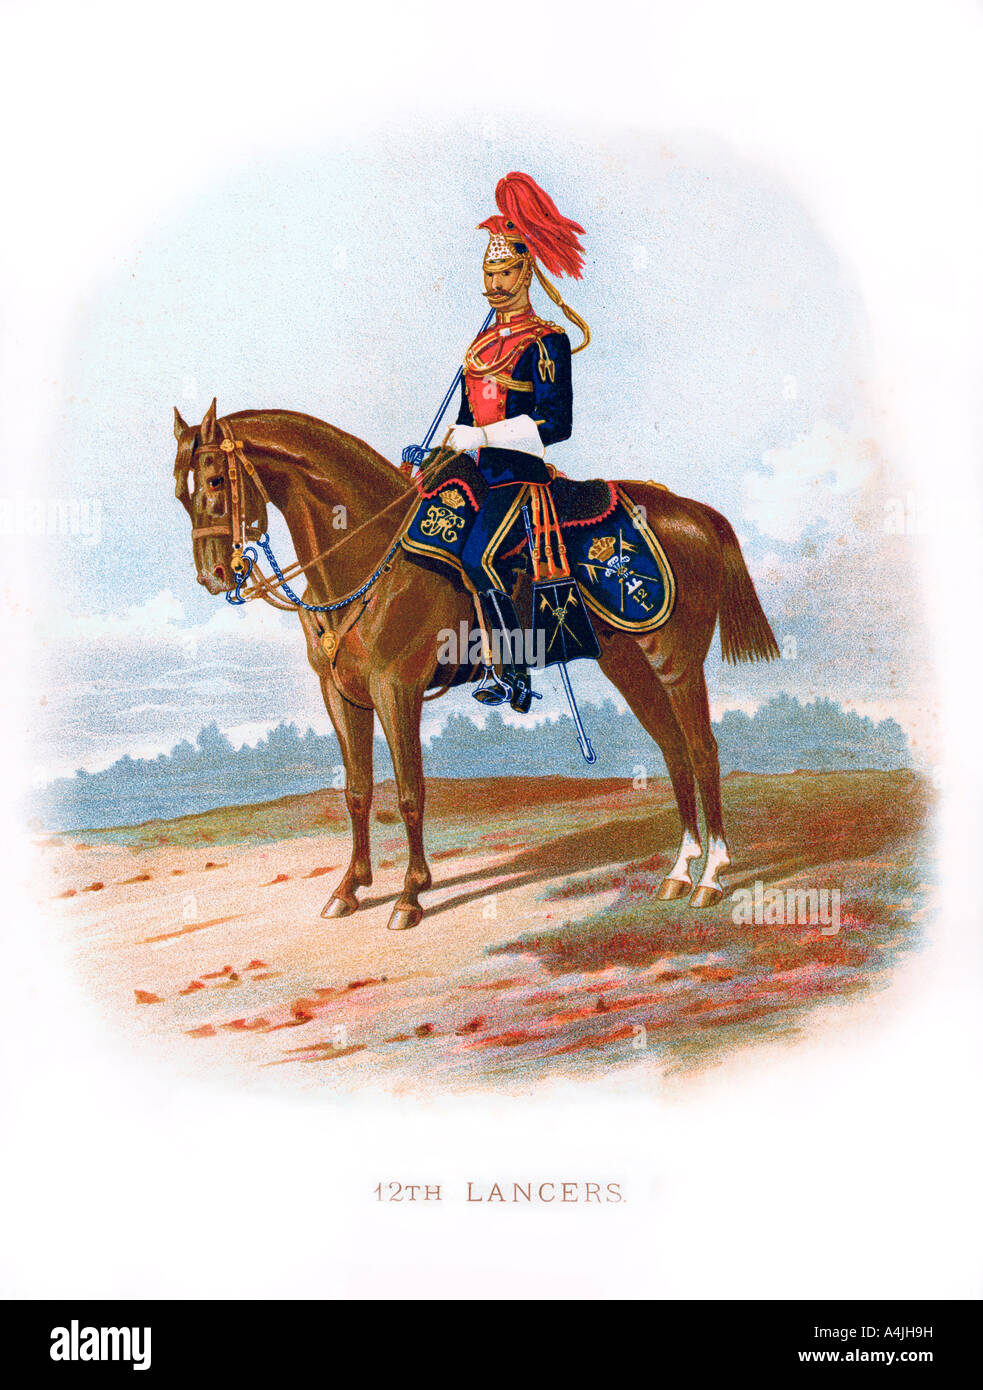 12th Lancers 1889  - Stock Image